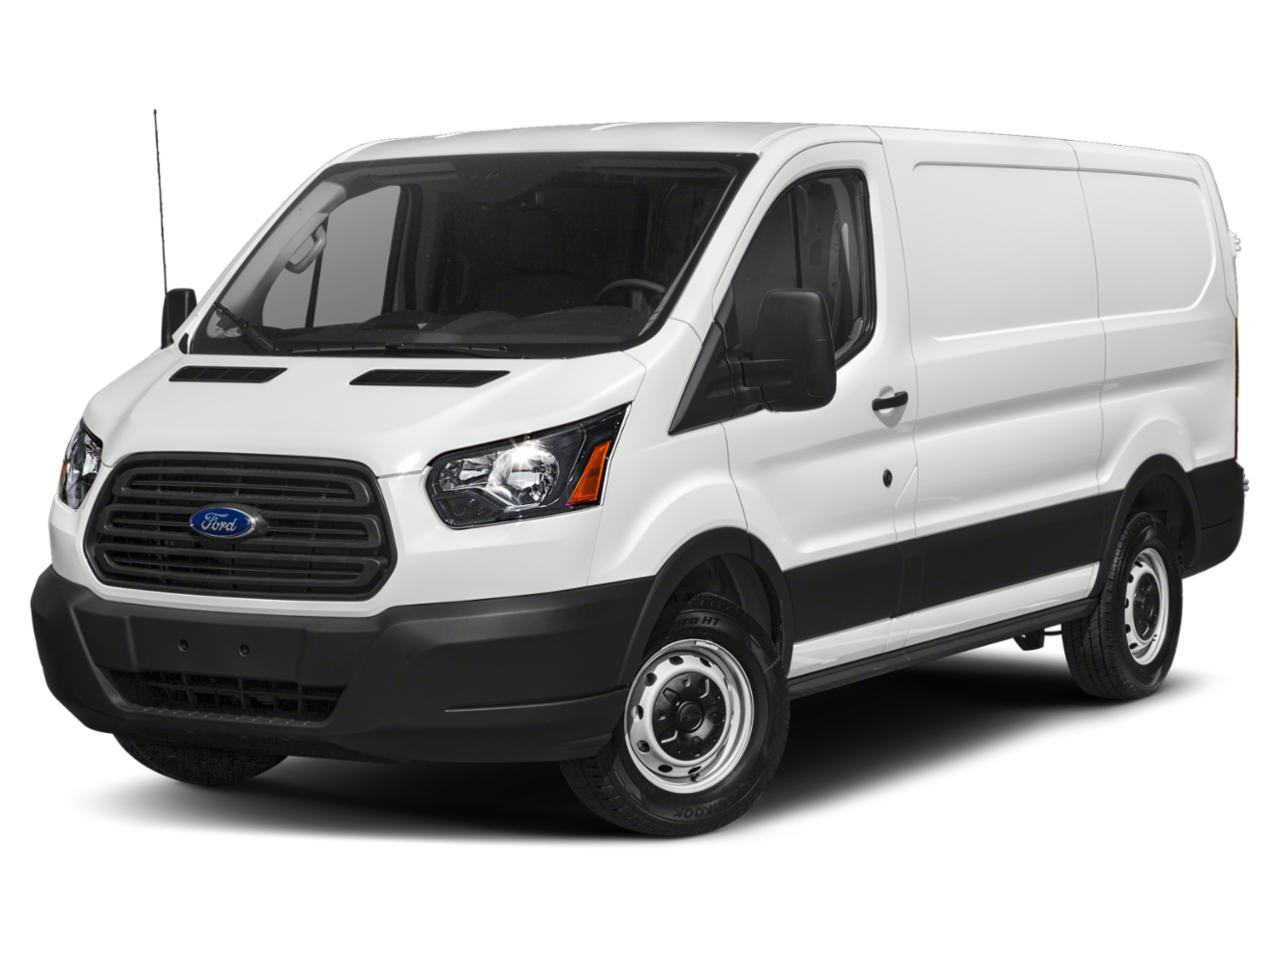 2019 Ford Transit Van Vehicle Photo in Plainfield, IL 60586